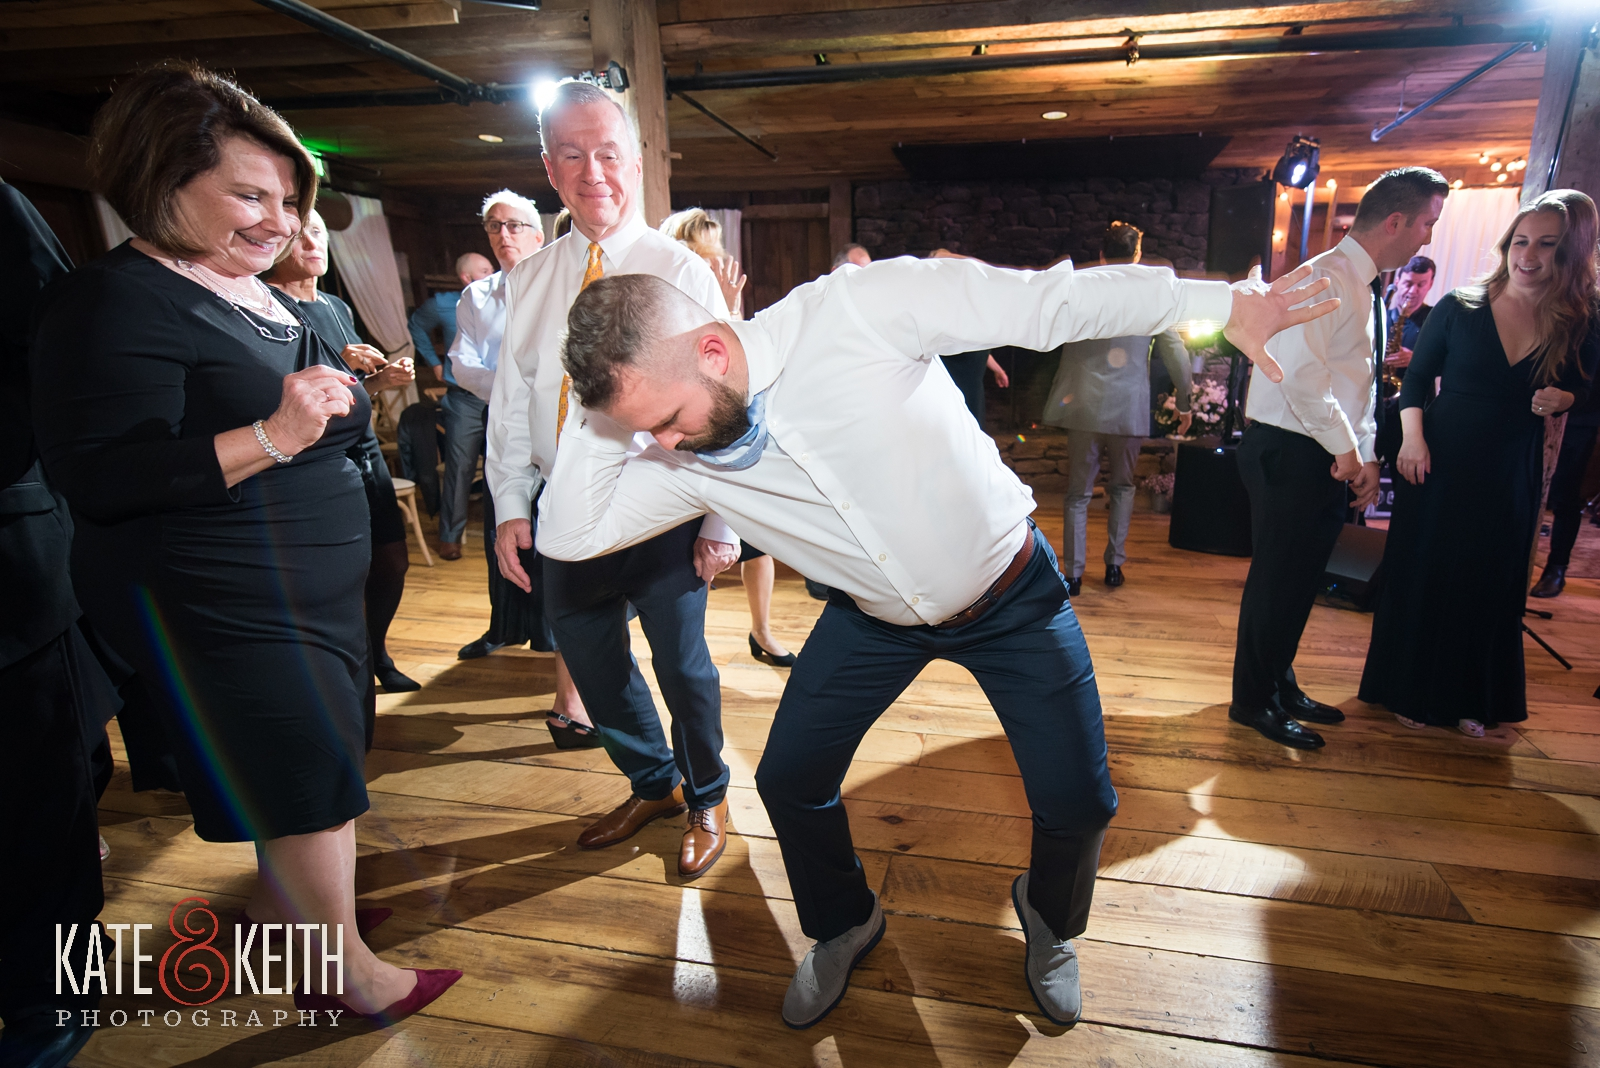 Barn on the Pemi dance floor, Splash band, wedding dancing, barn wedding, wedding reception, New Hampshire barn wedding, dance moves, groomsmen dancing